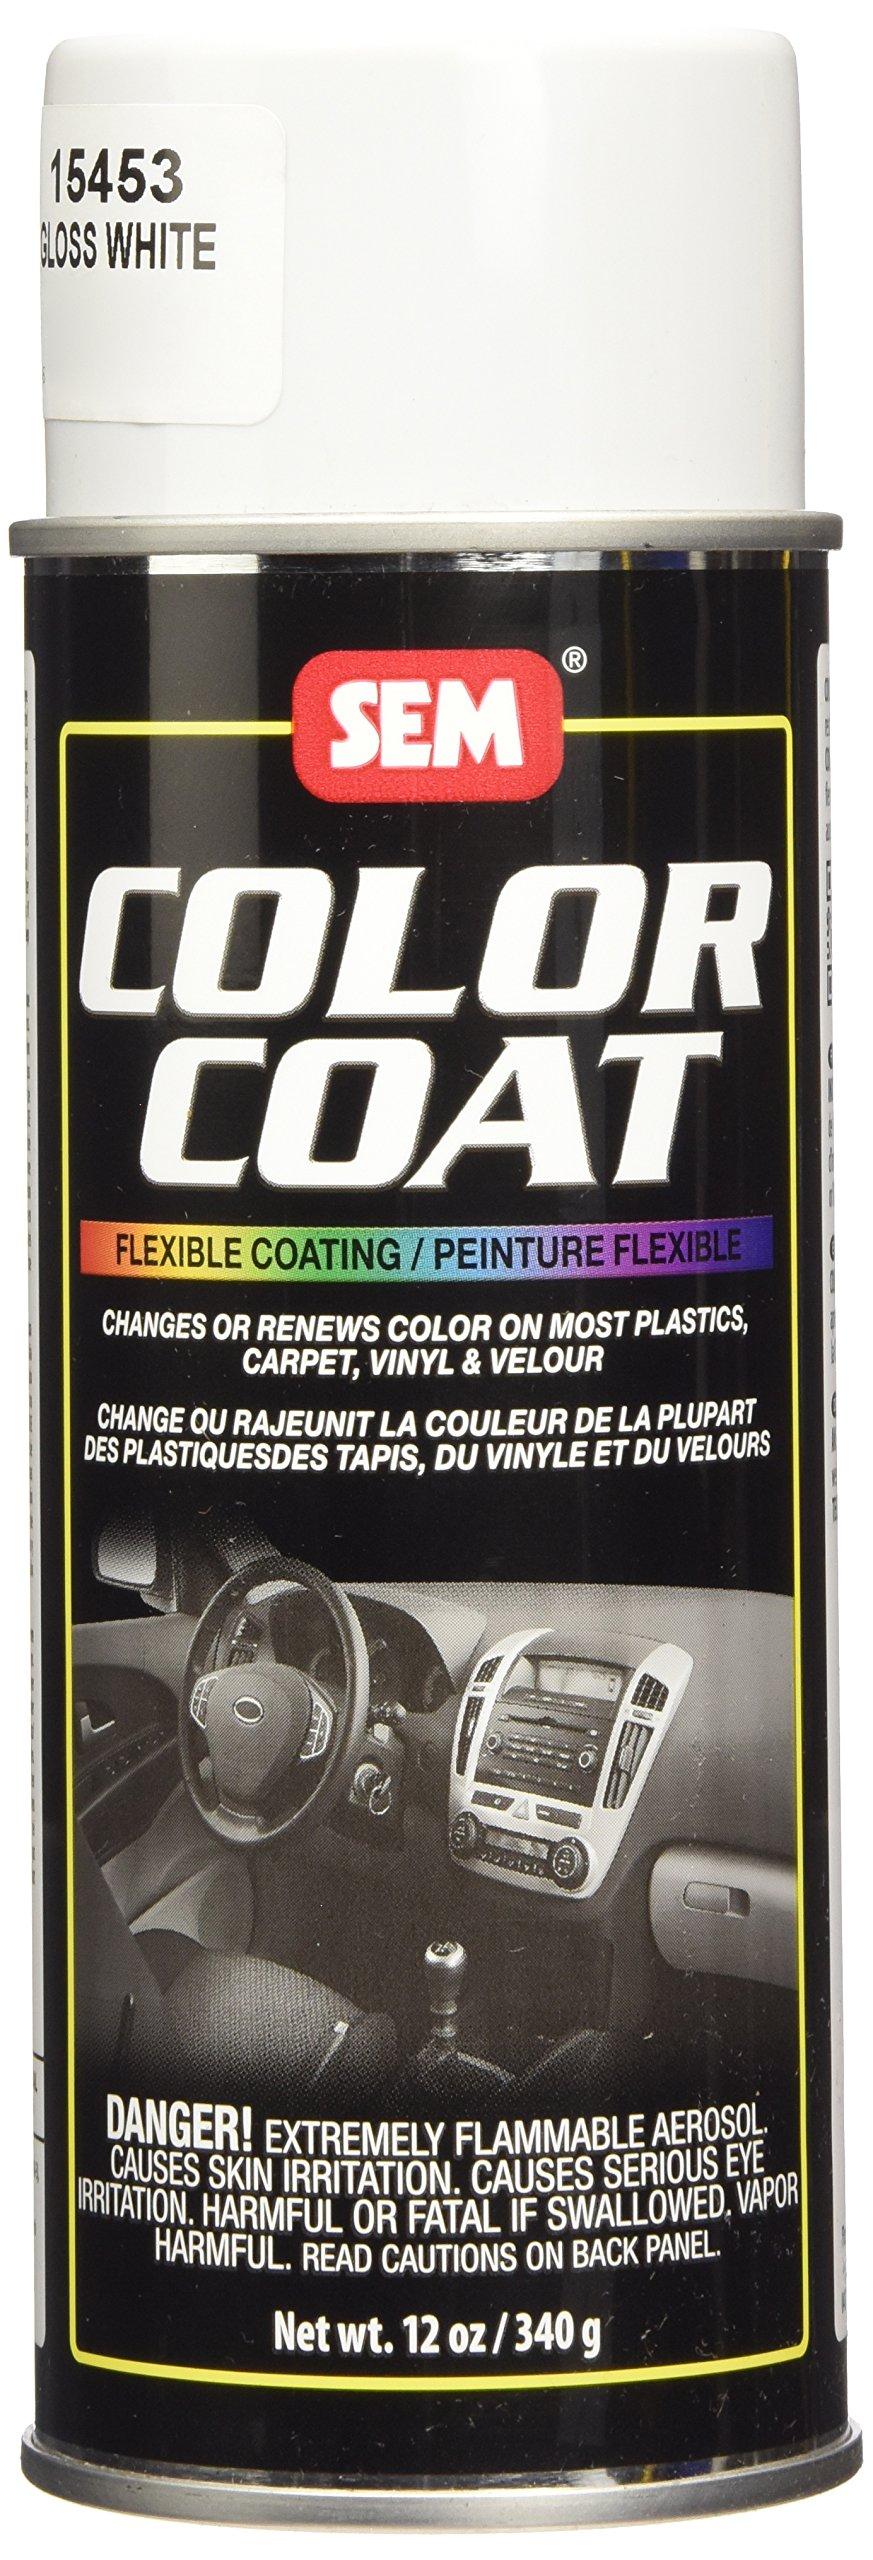 SEM 15453 Gloss White Color Coat - 12 oz.